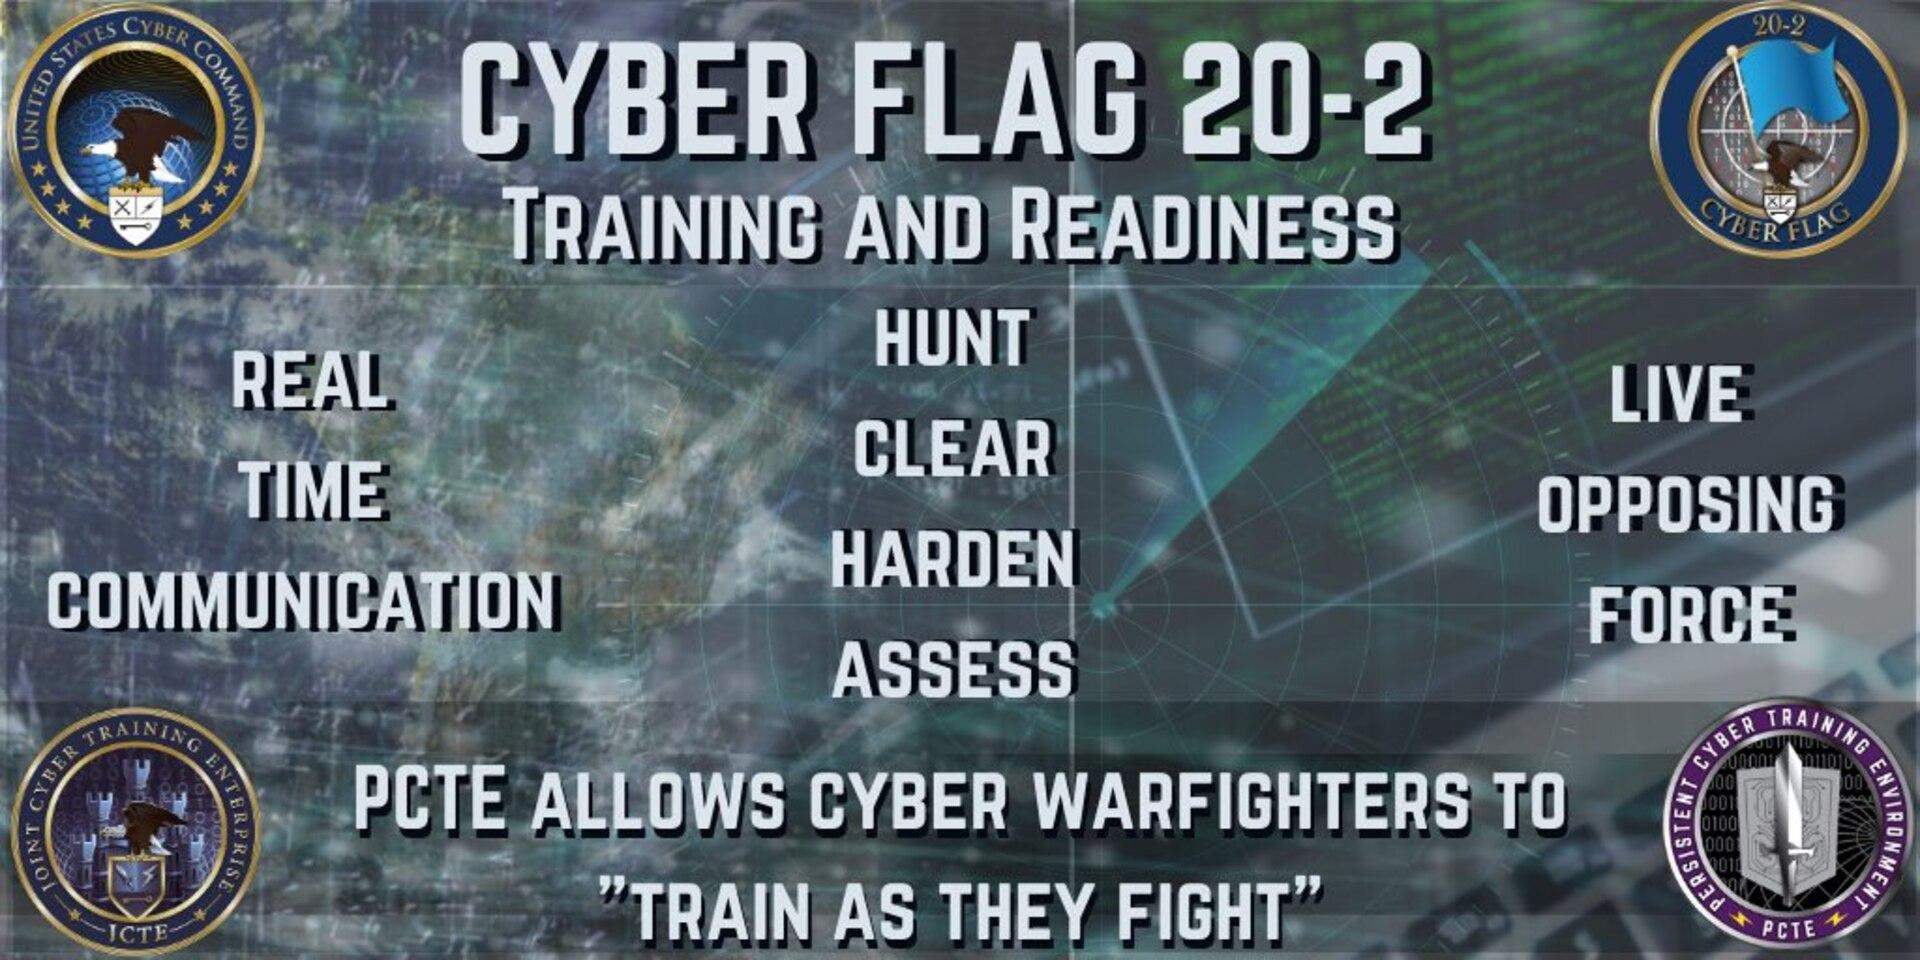 Cyber Flag 20-2 Partnership